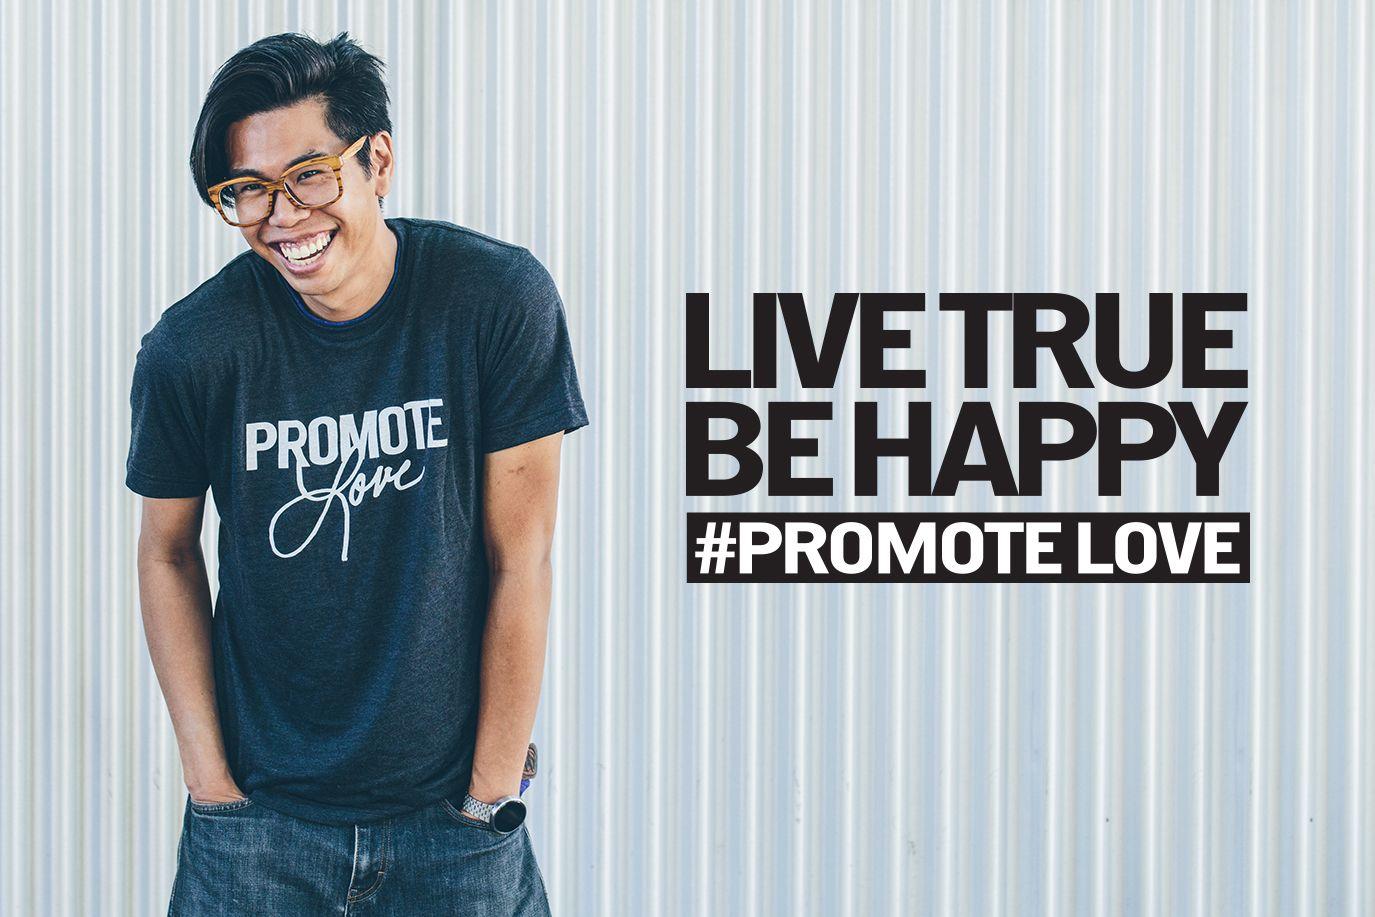 live true, be happy shirt in medium